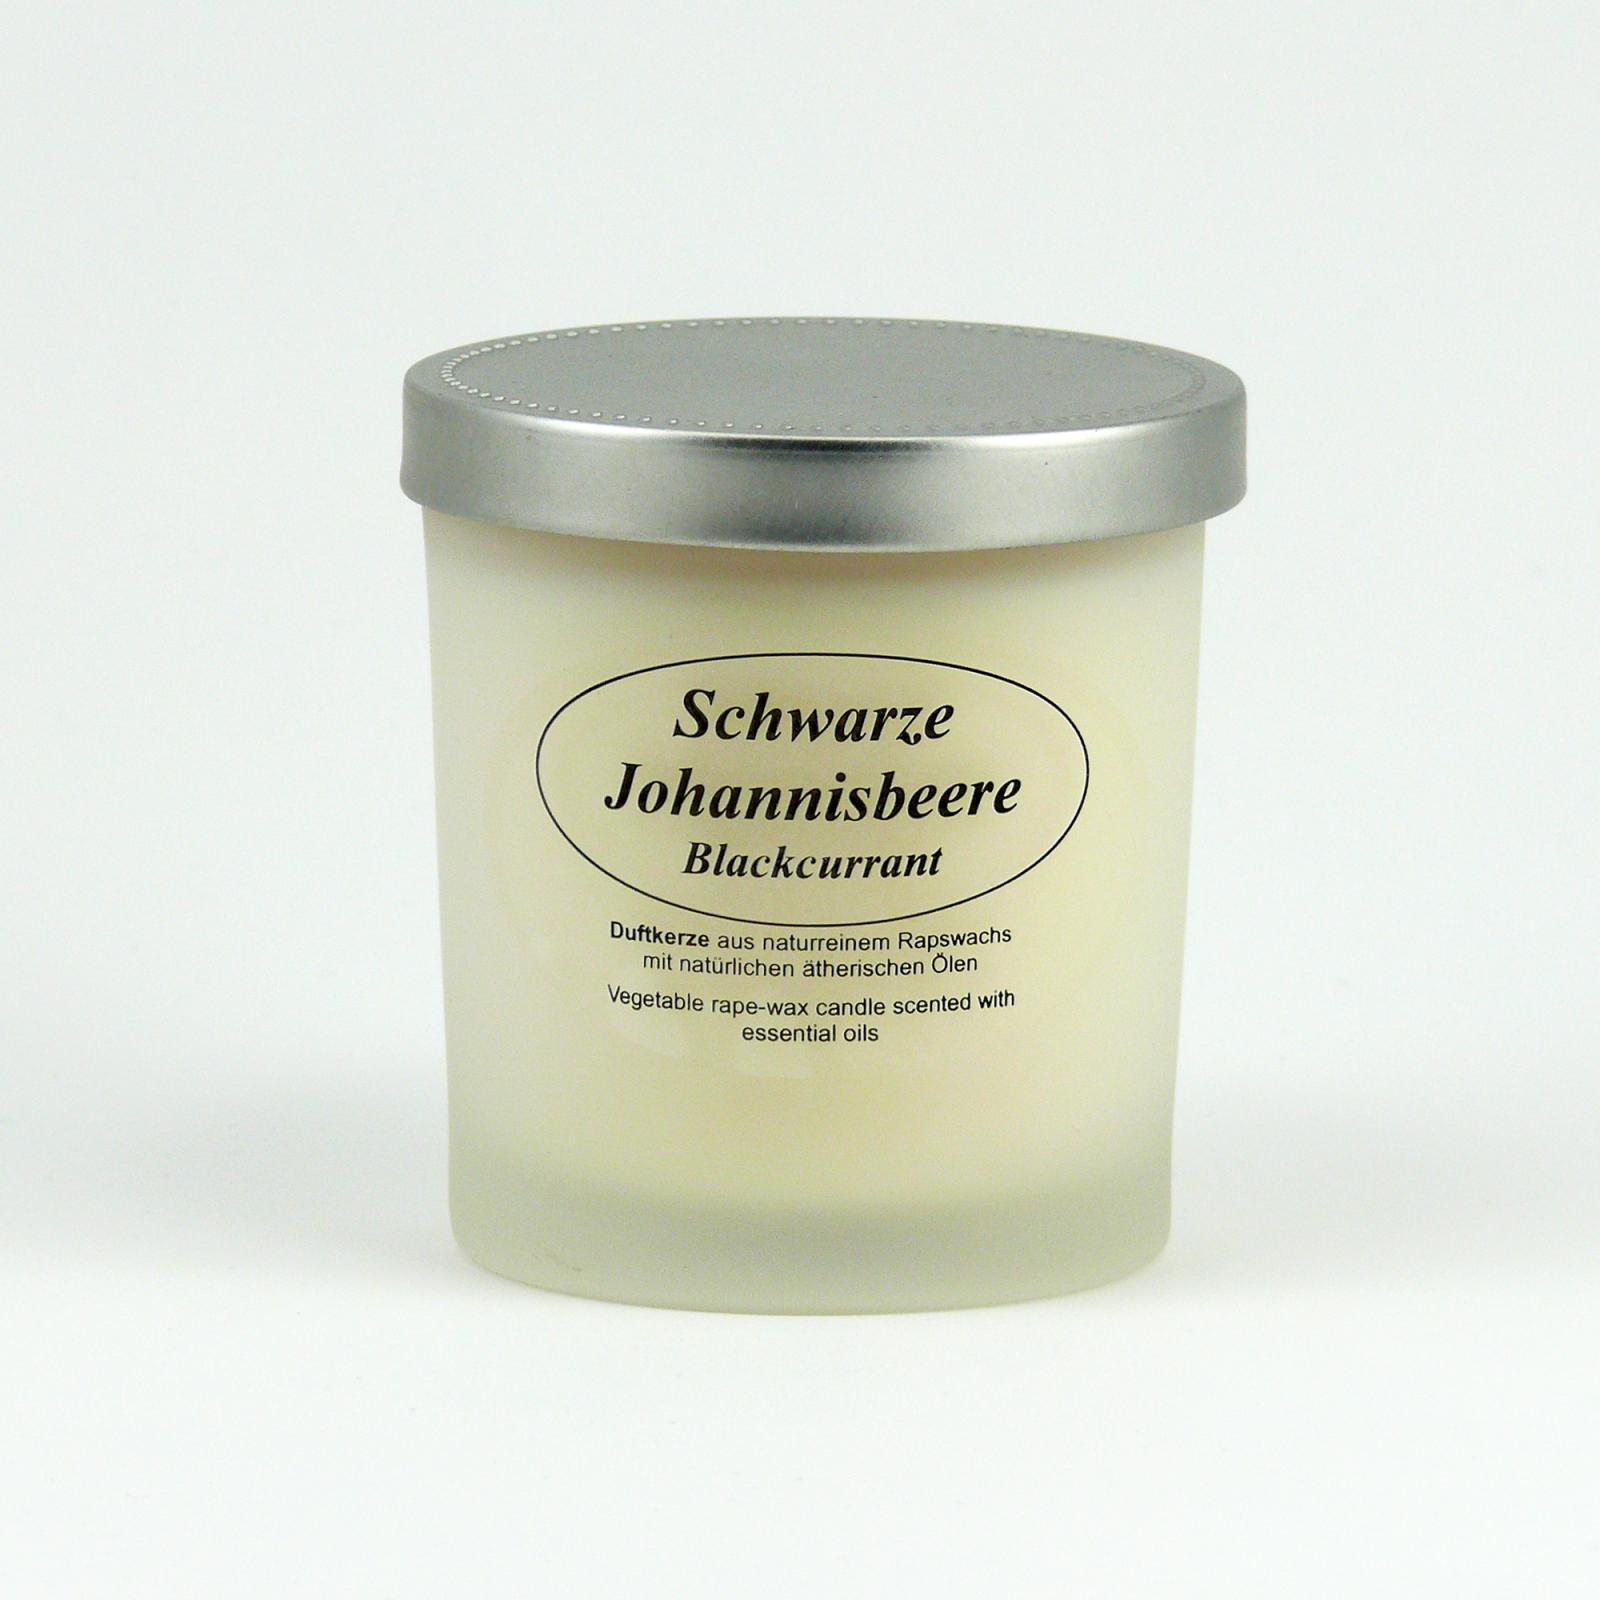 Kerzenfarm Přírodní svíčka Blackcurrant, mléčné sklo 8 cm